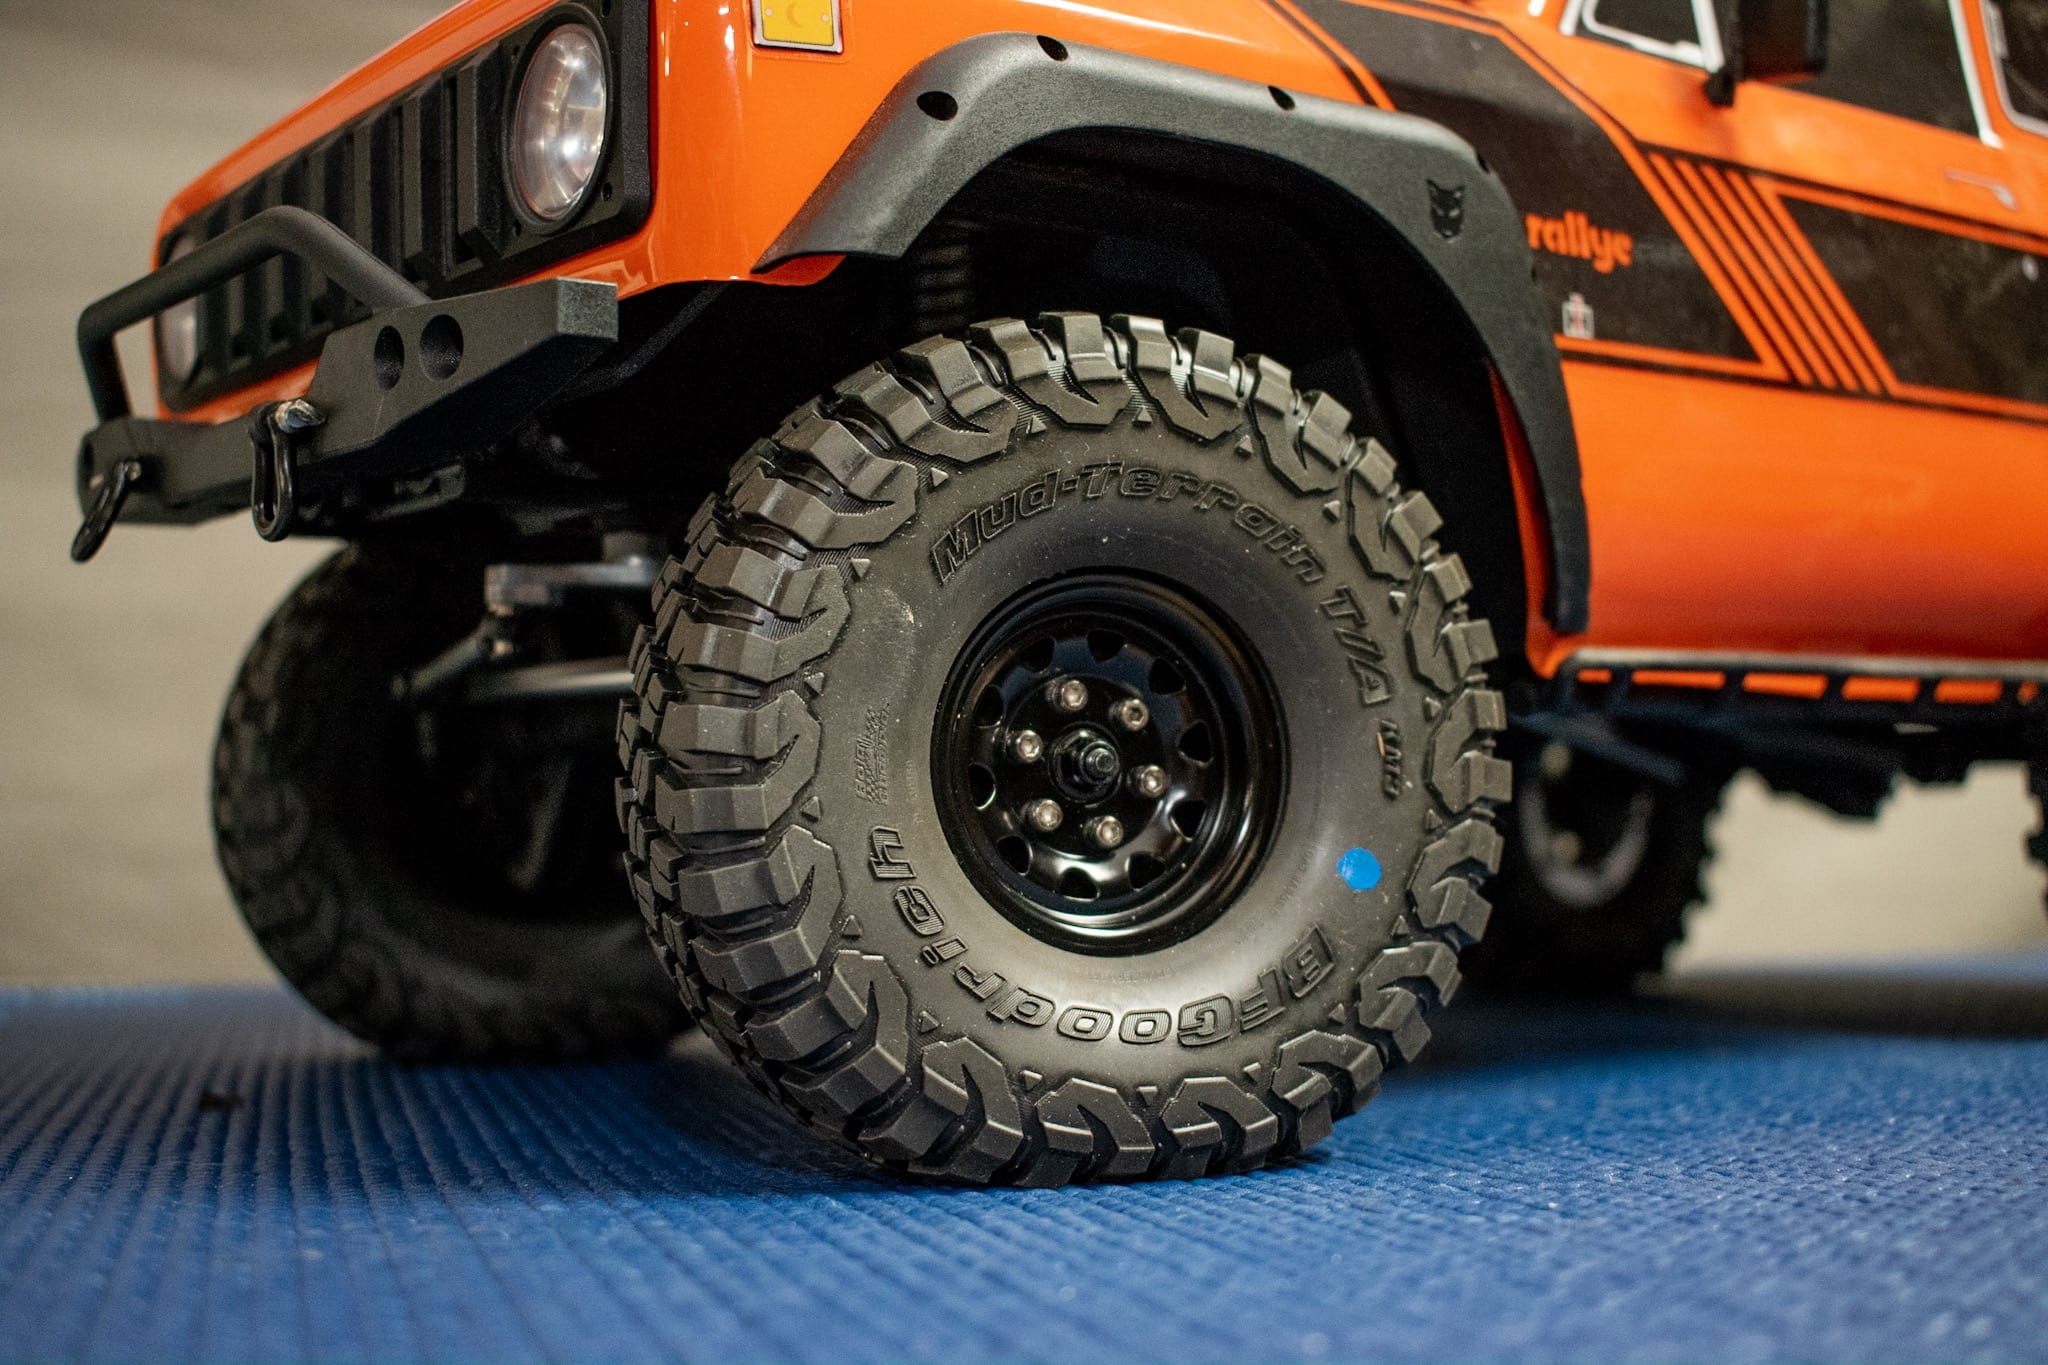 Hands-on with Pro-Line's BFGoodrich KM3 1.9″ Predator Rock Terrain Tires